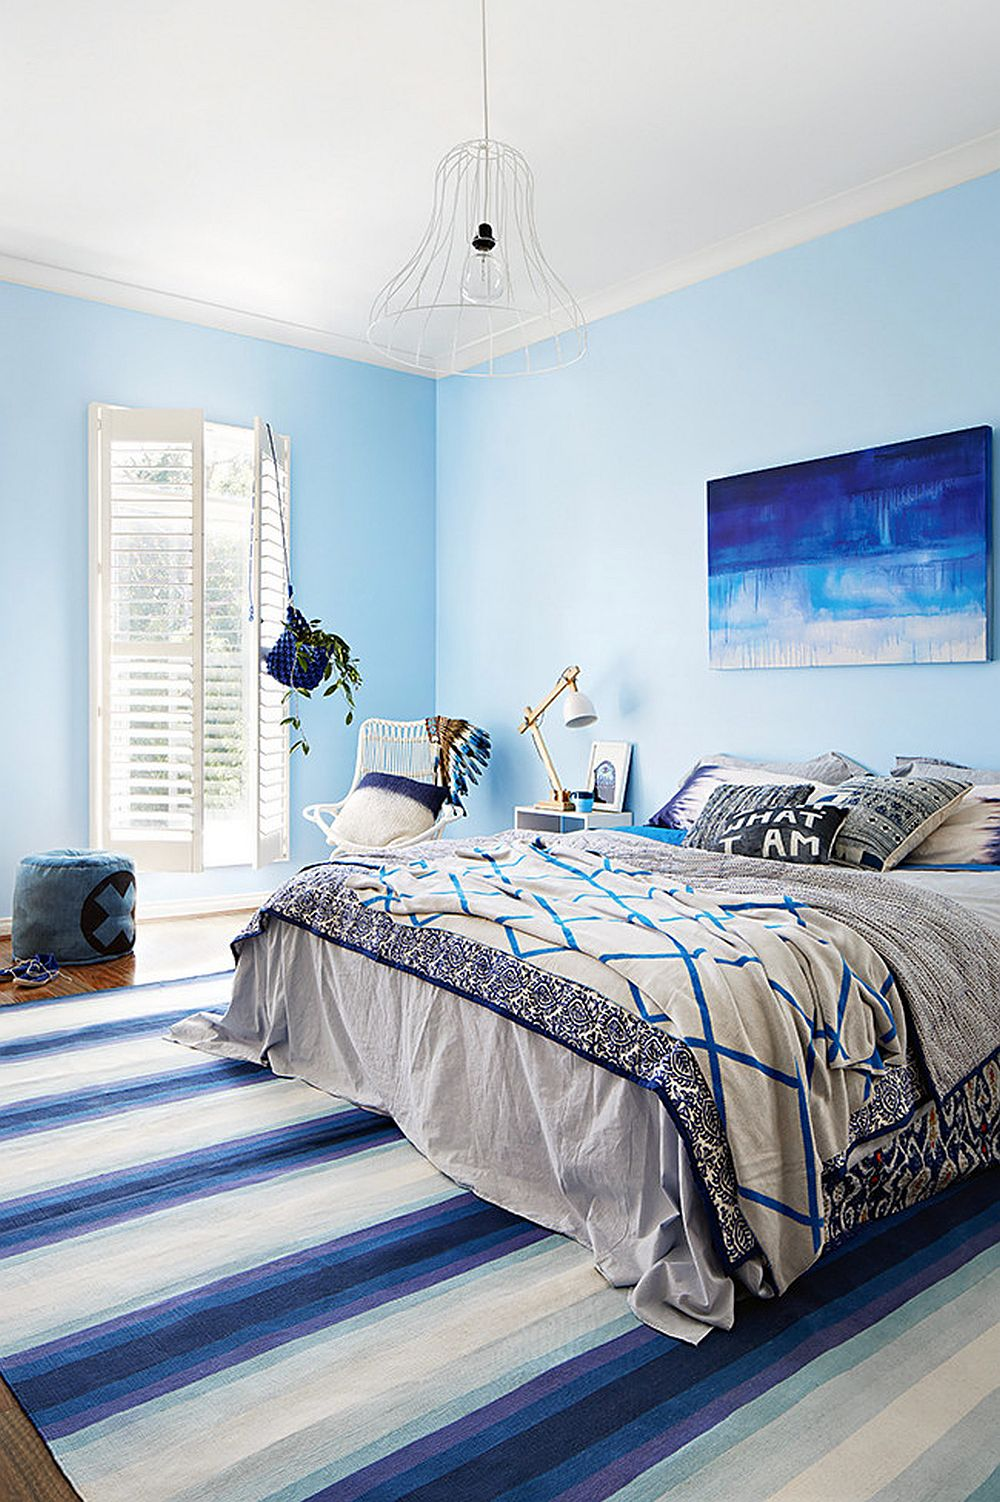 adelaparvu.com despre acelasi dormitor 2 variante de decorare, stilist Julia Green, Foto Armelle Habib  (6)